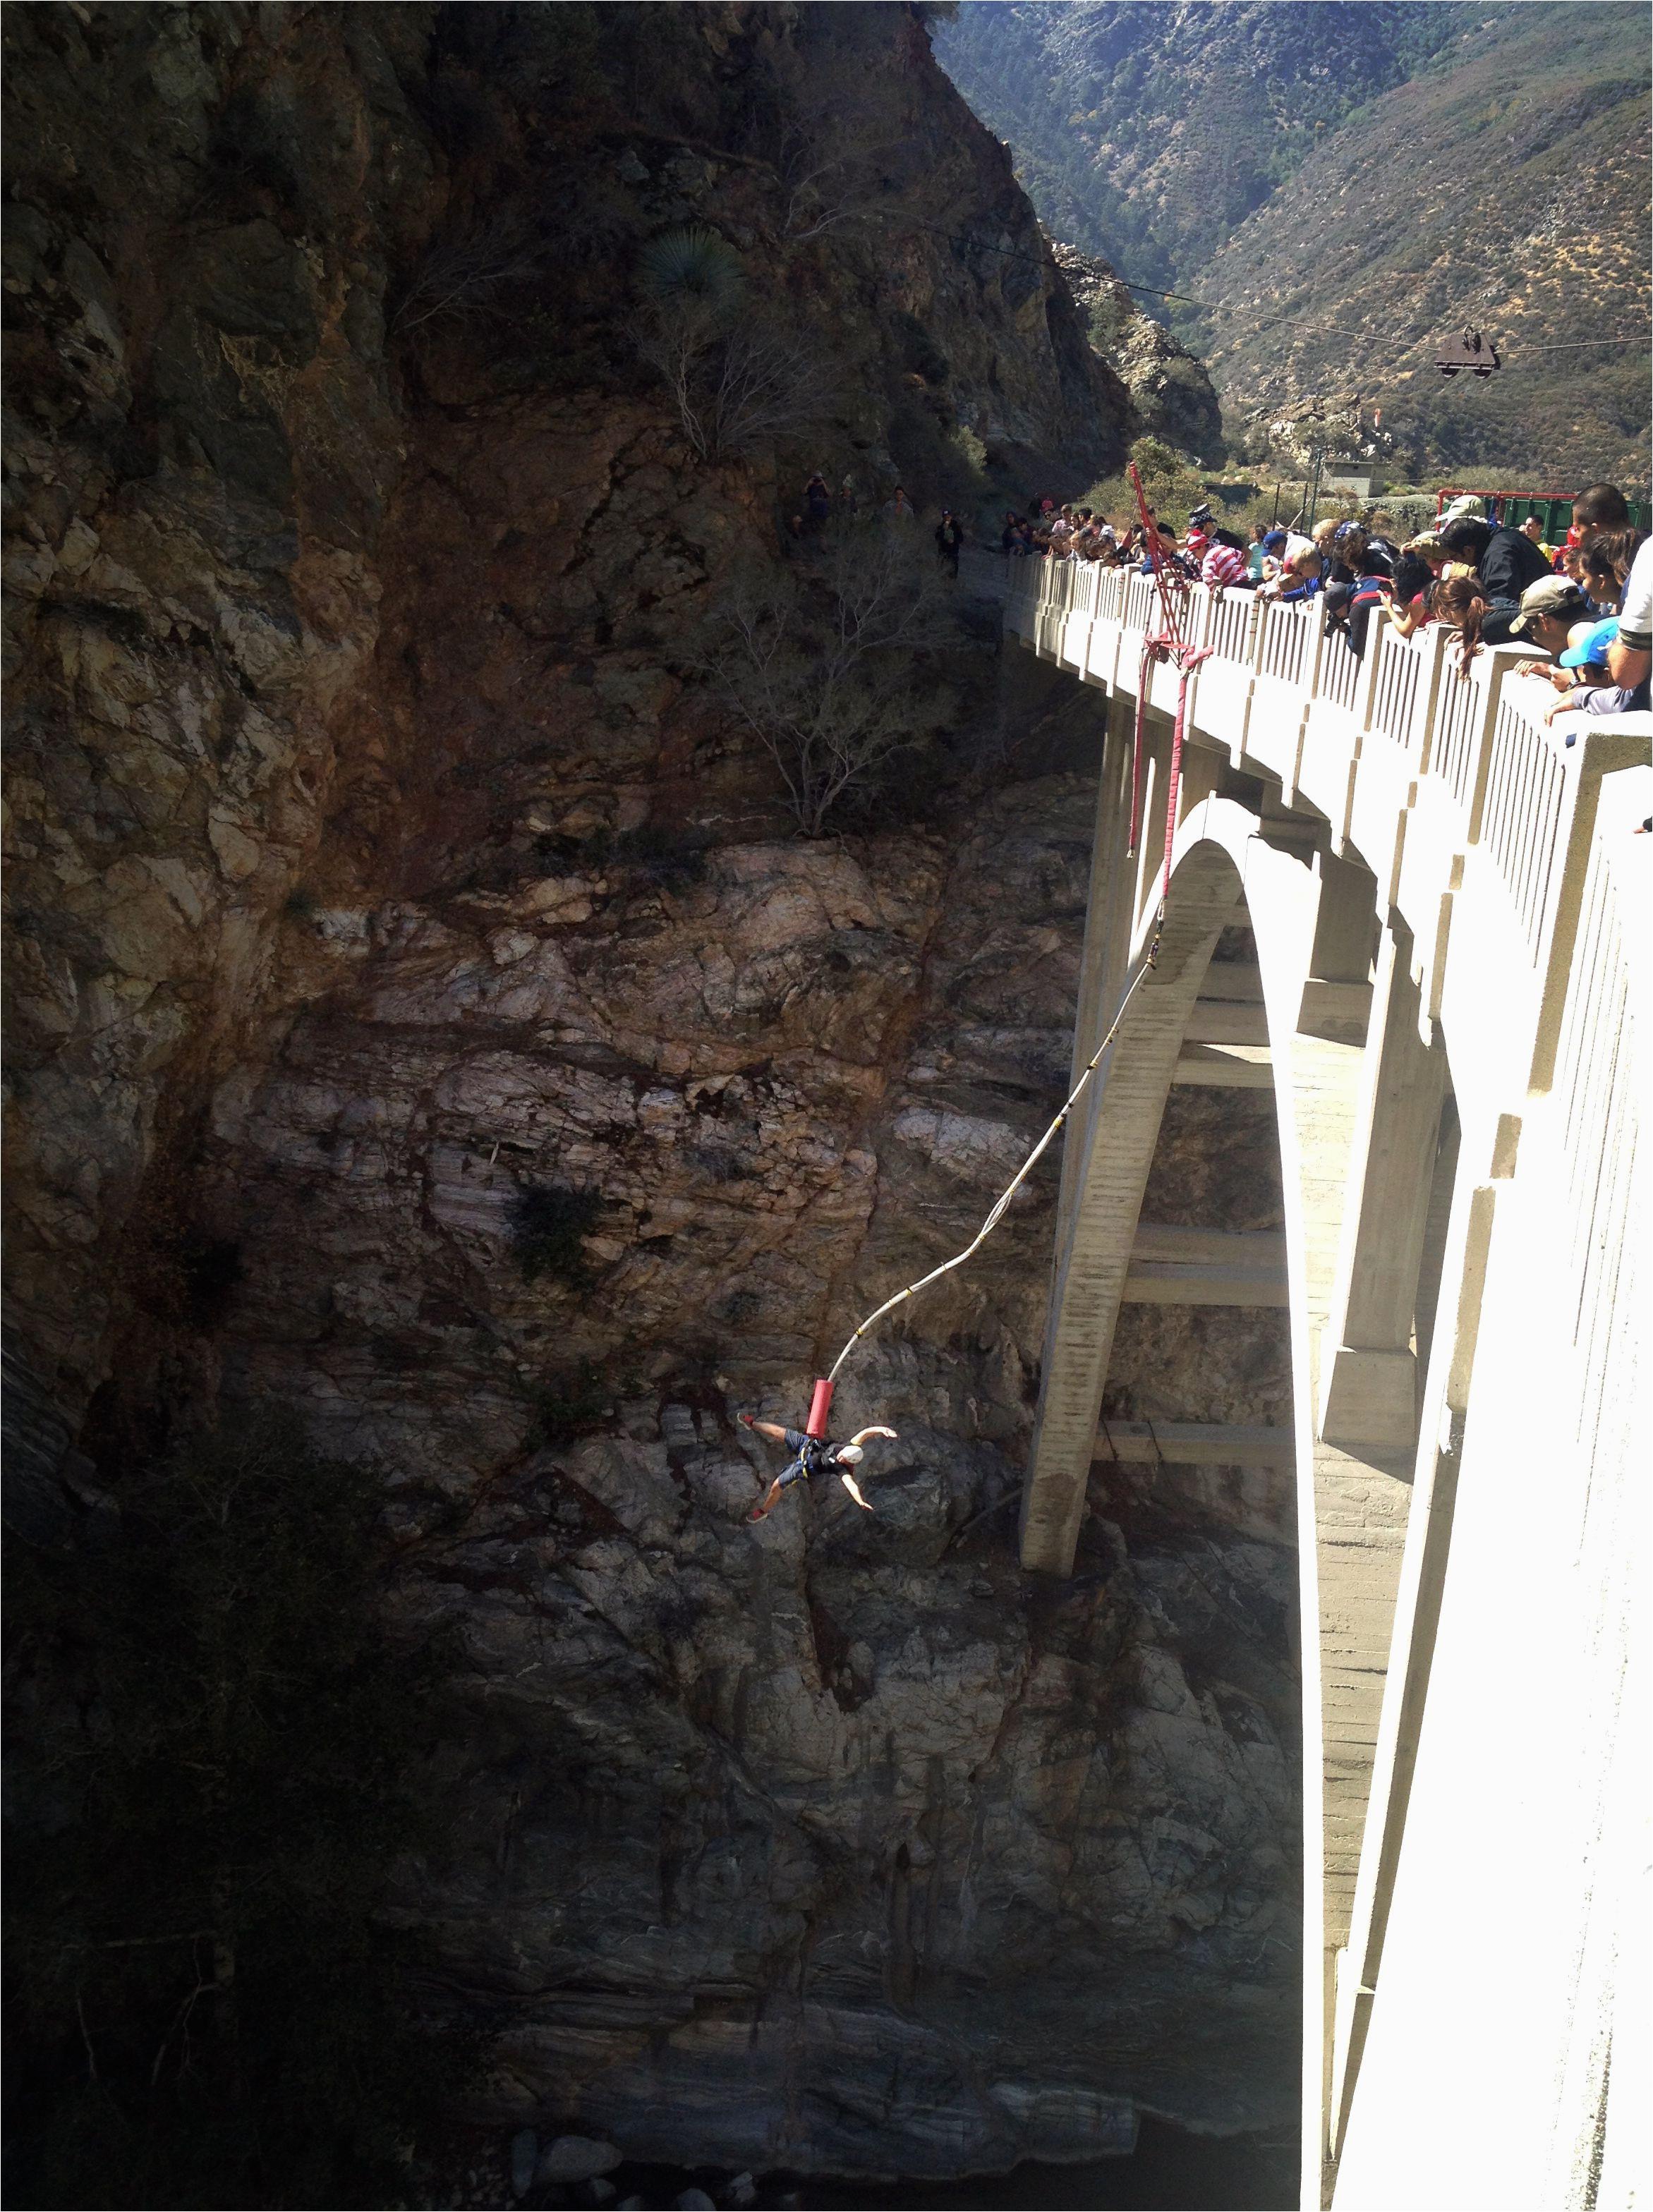 bungee jumping bridge to nowhere san gabriel mountains azusa ca